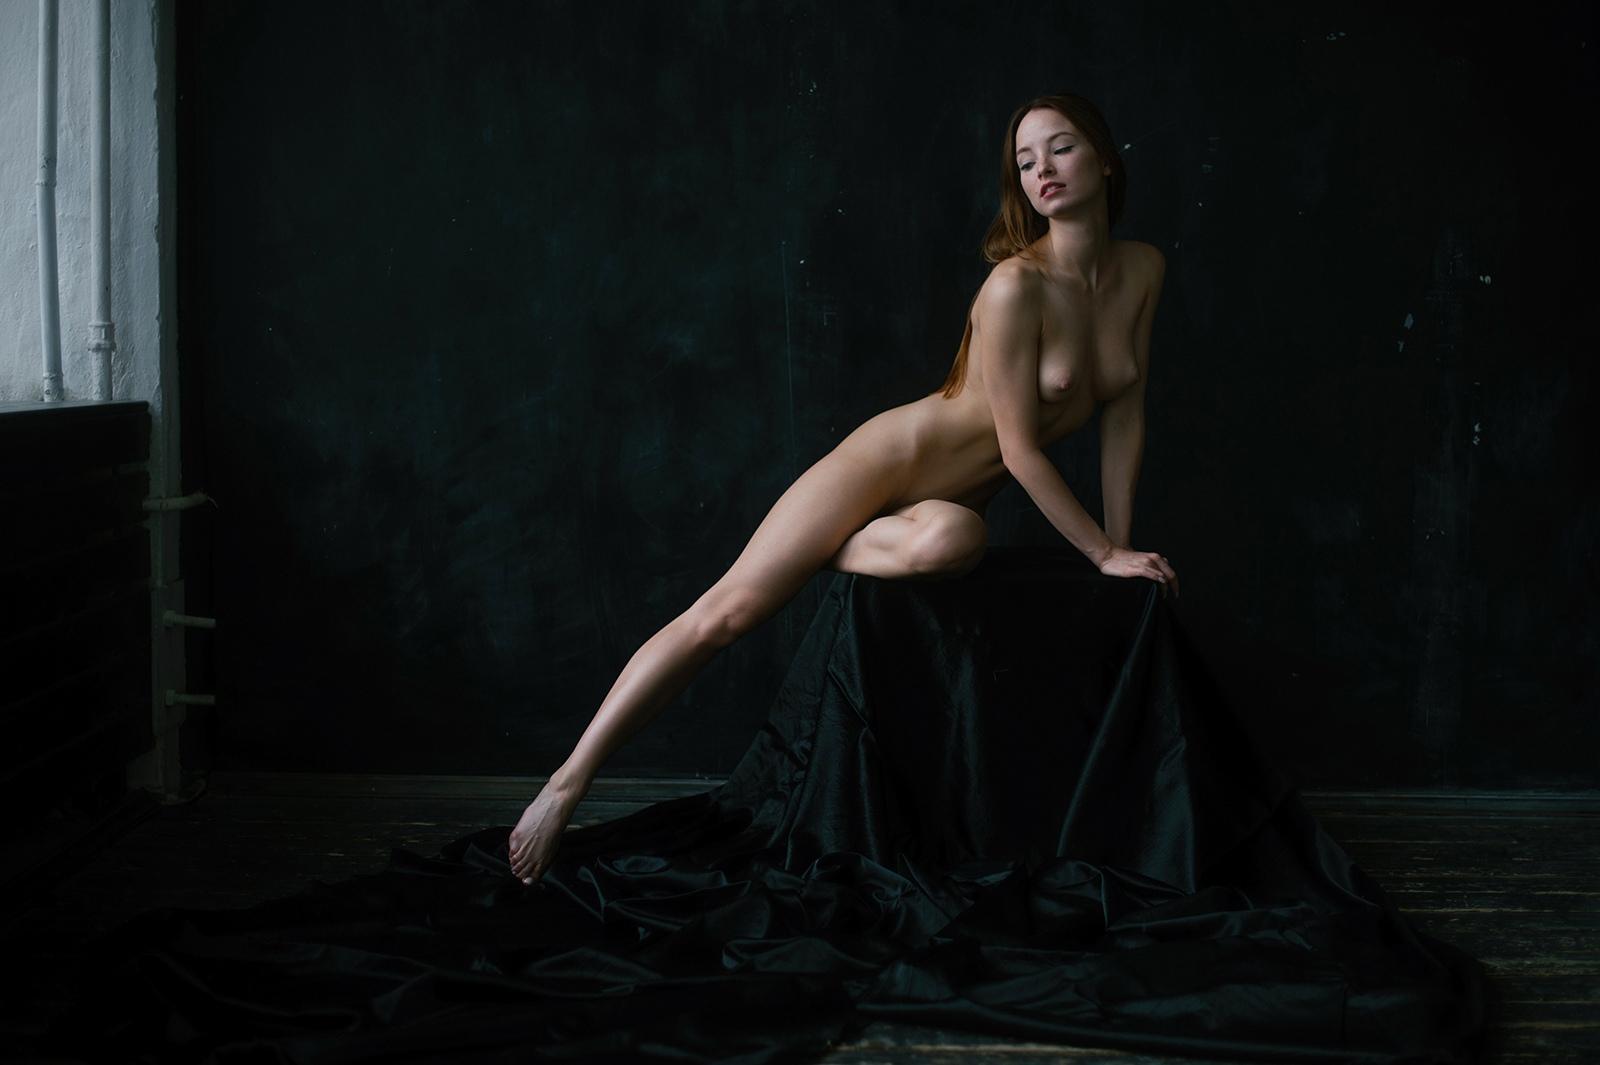 Фотограф Евгений Ерчак